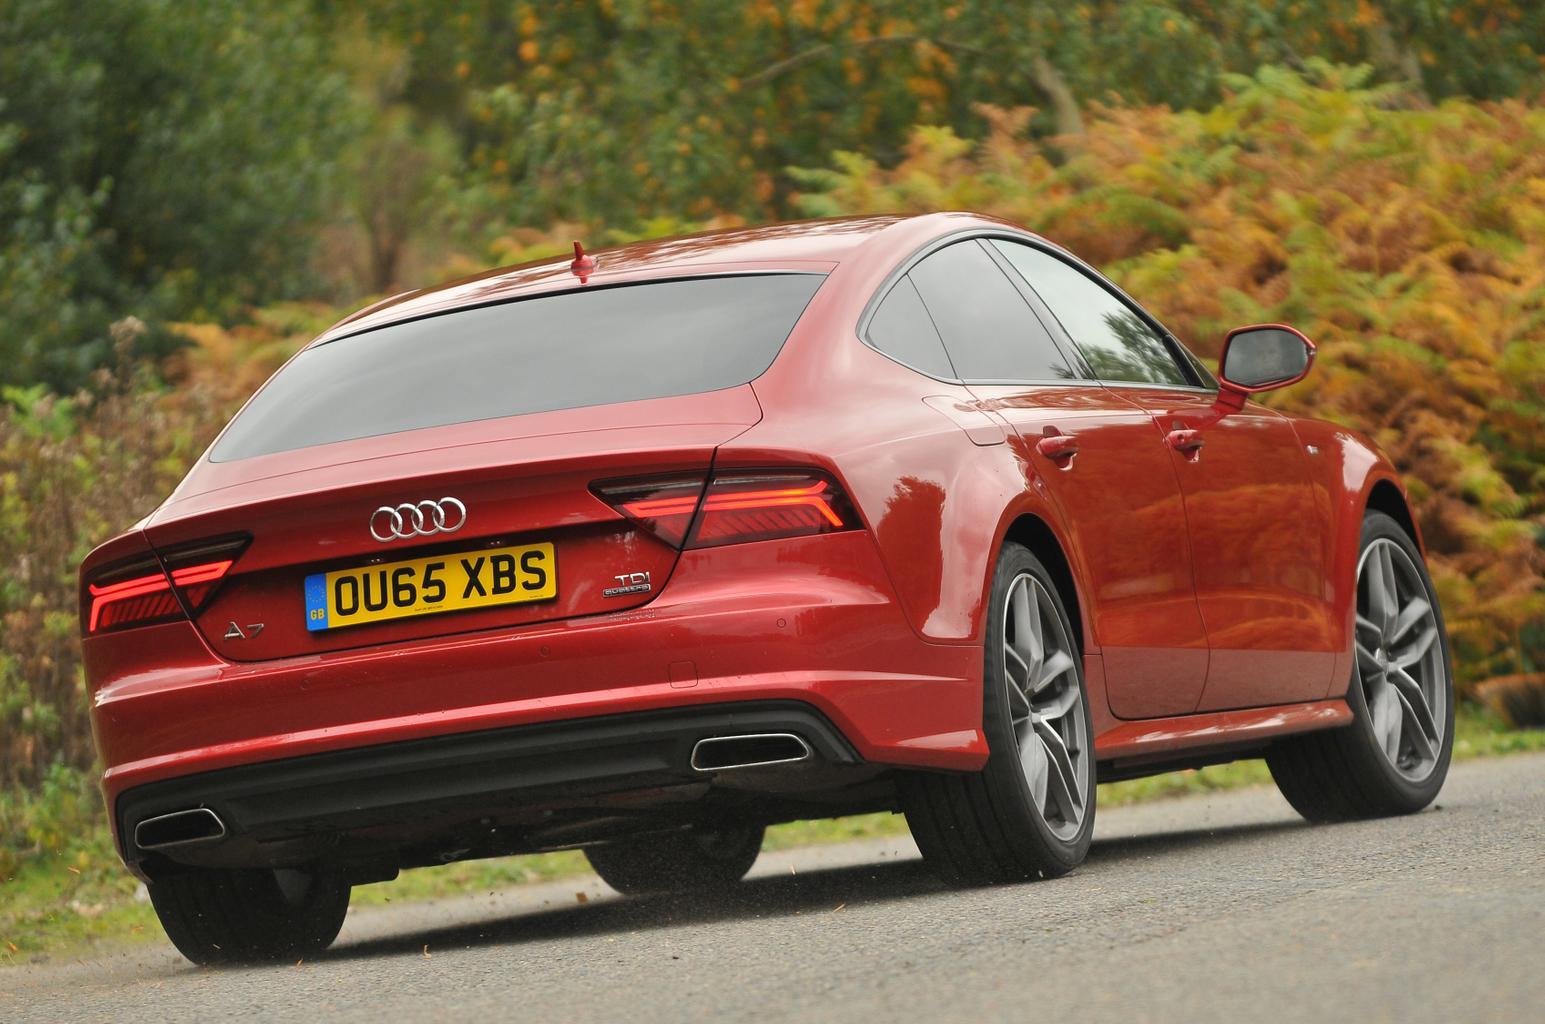 Audi A7 Sportback vs BMW 5 Series vs Jaguar XF